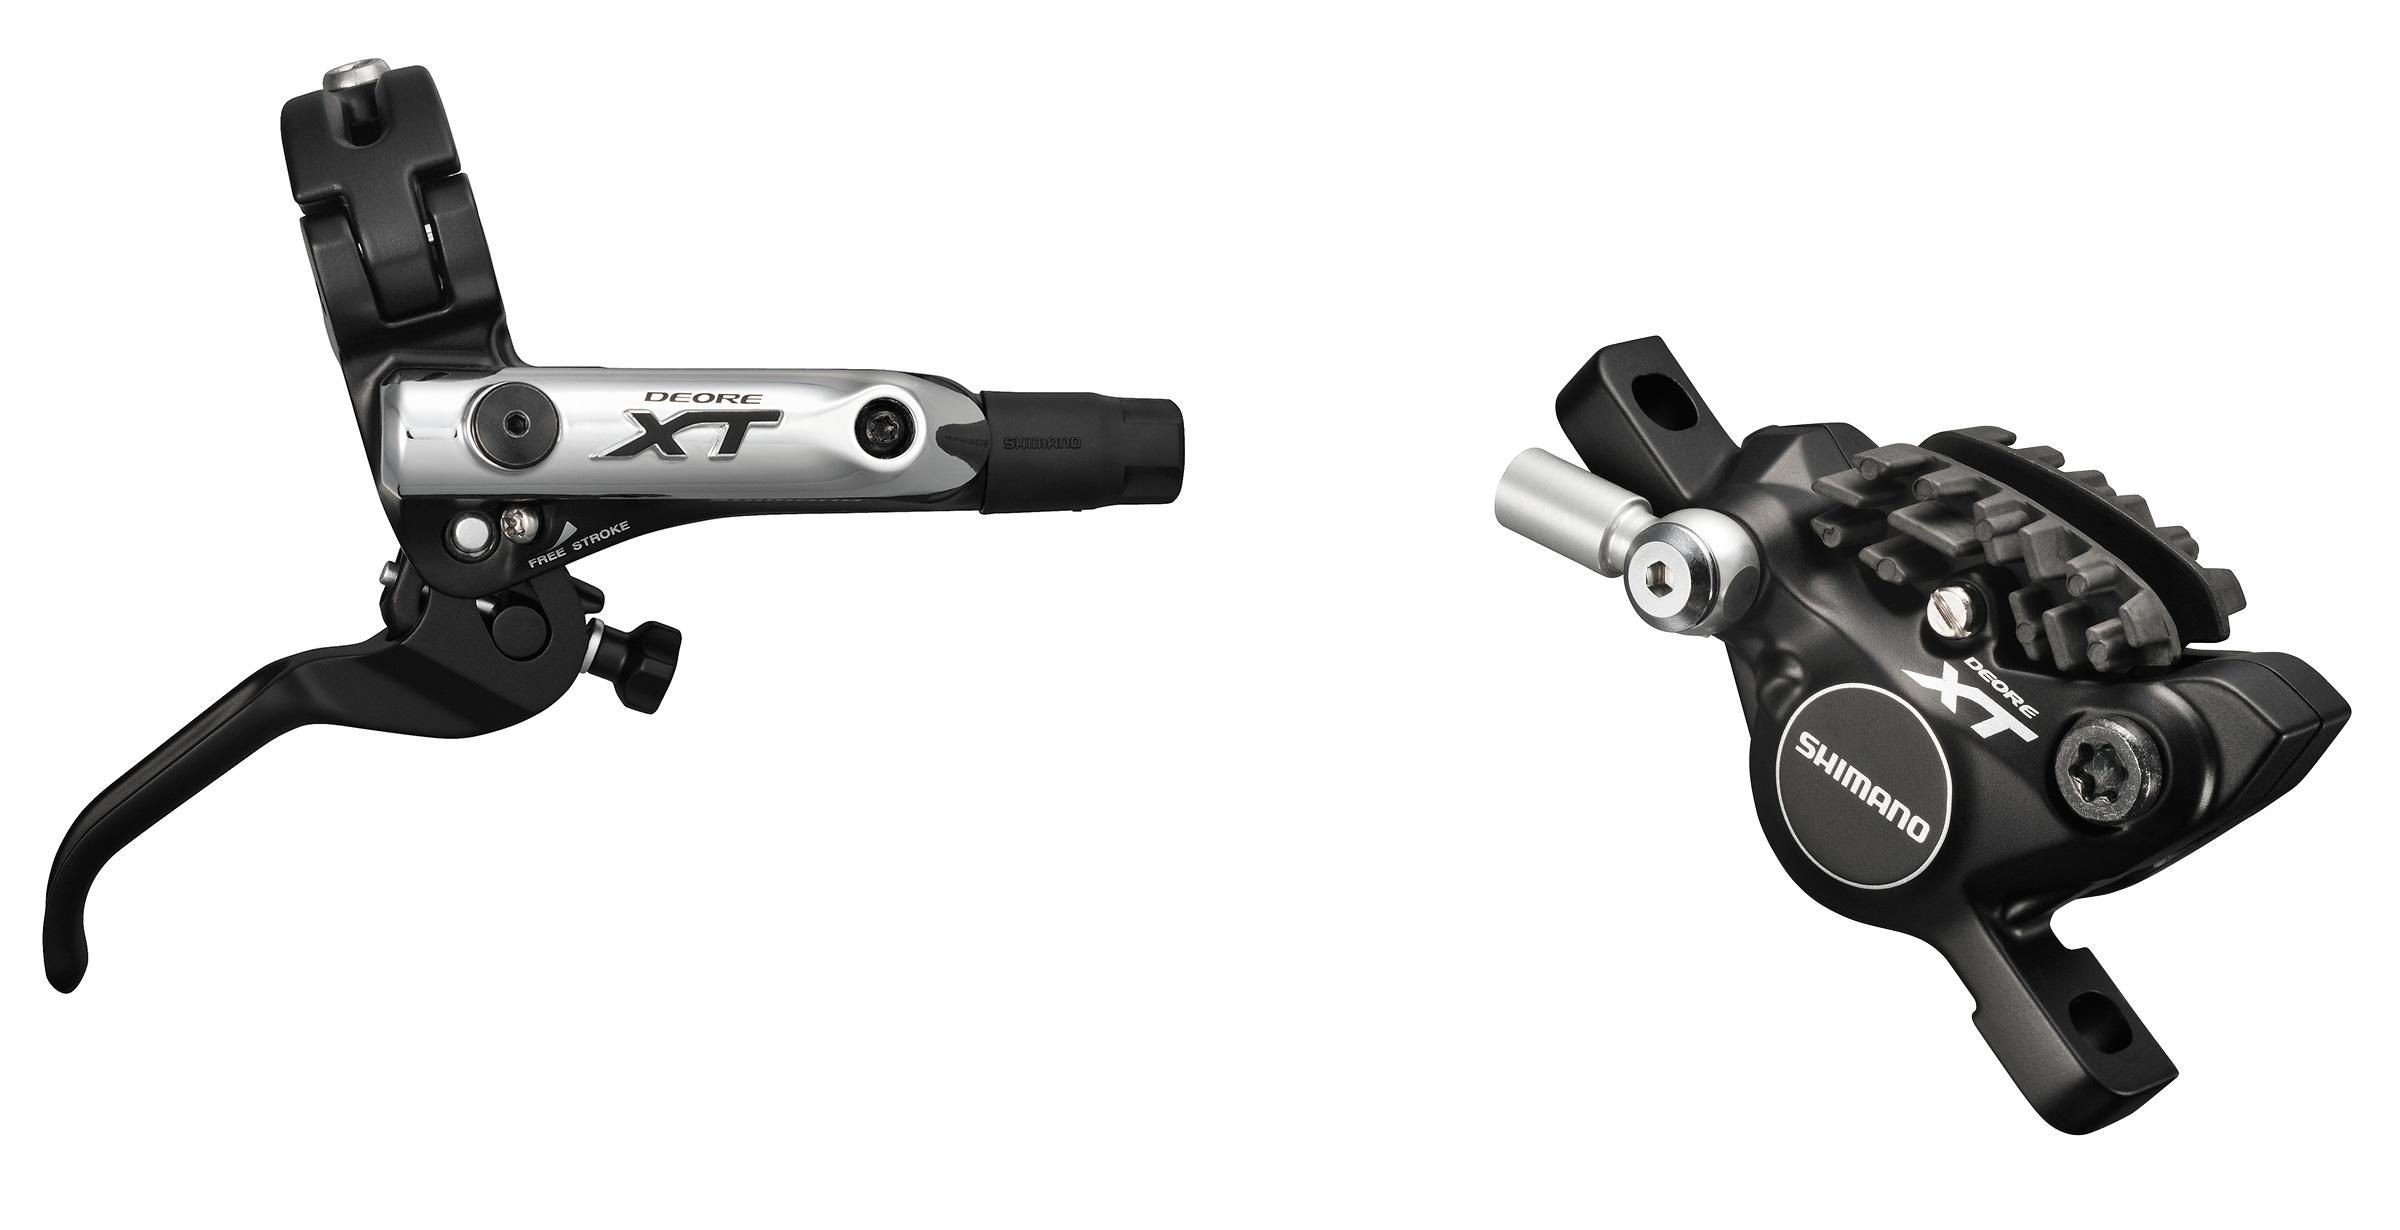 29299de5547 Shimano Deore XT Disc Brakeset (Rear) - www.evocycles.ca